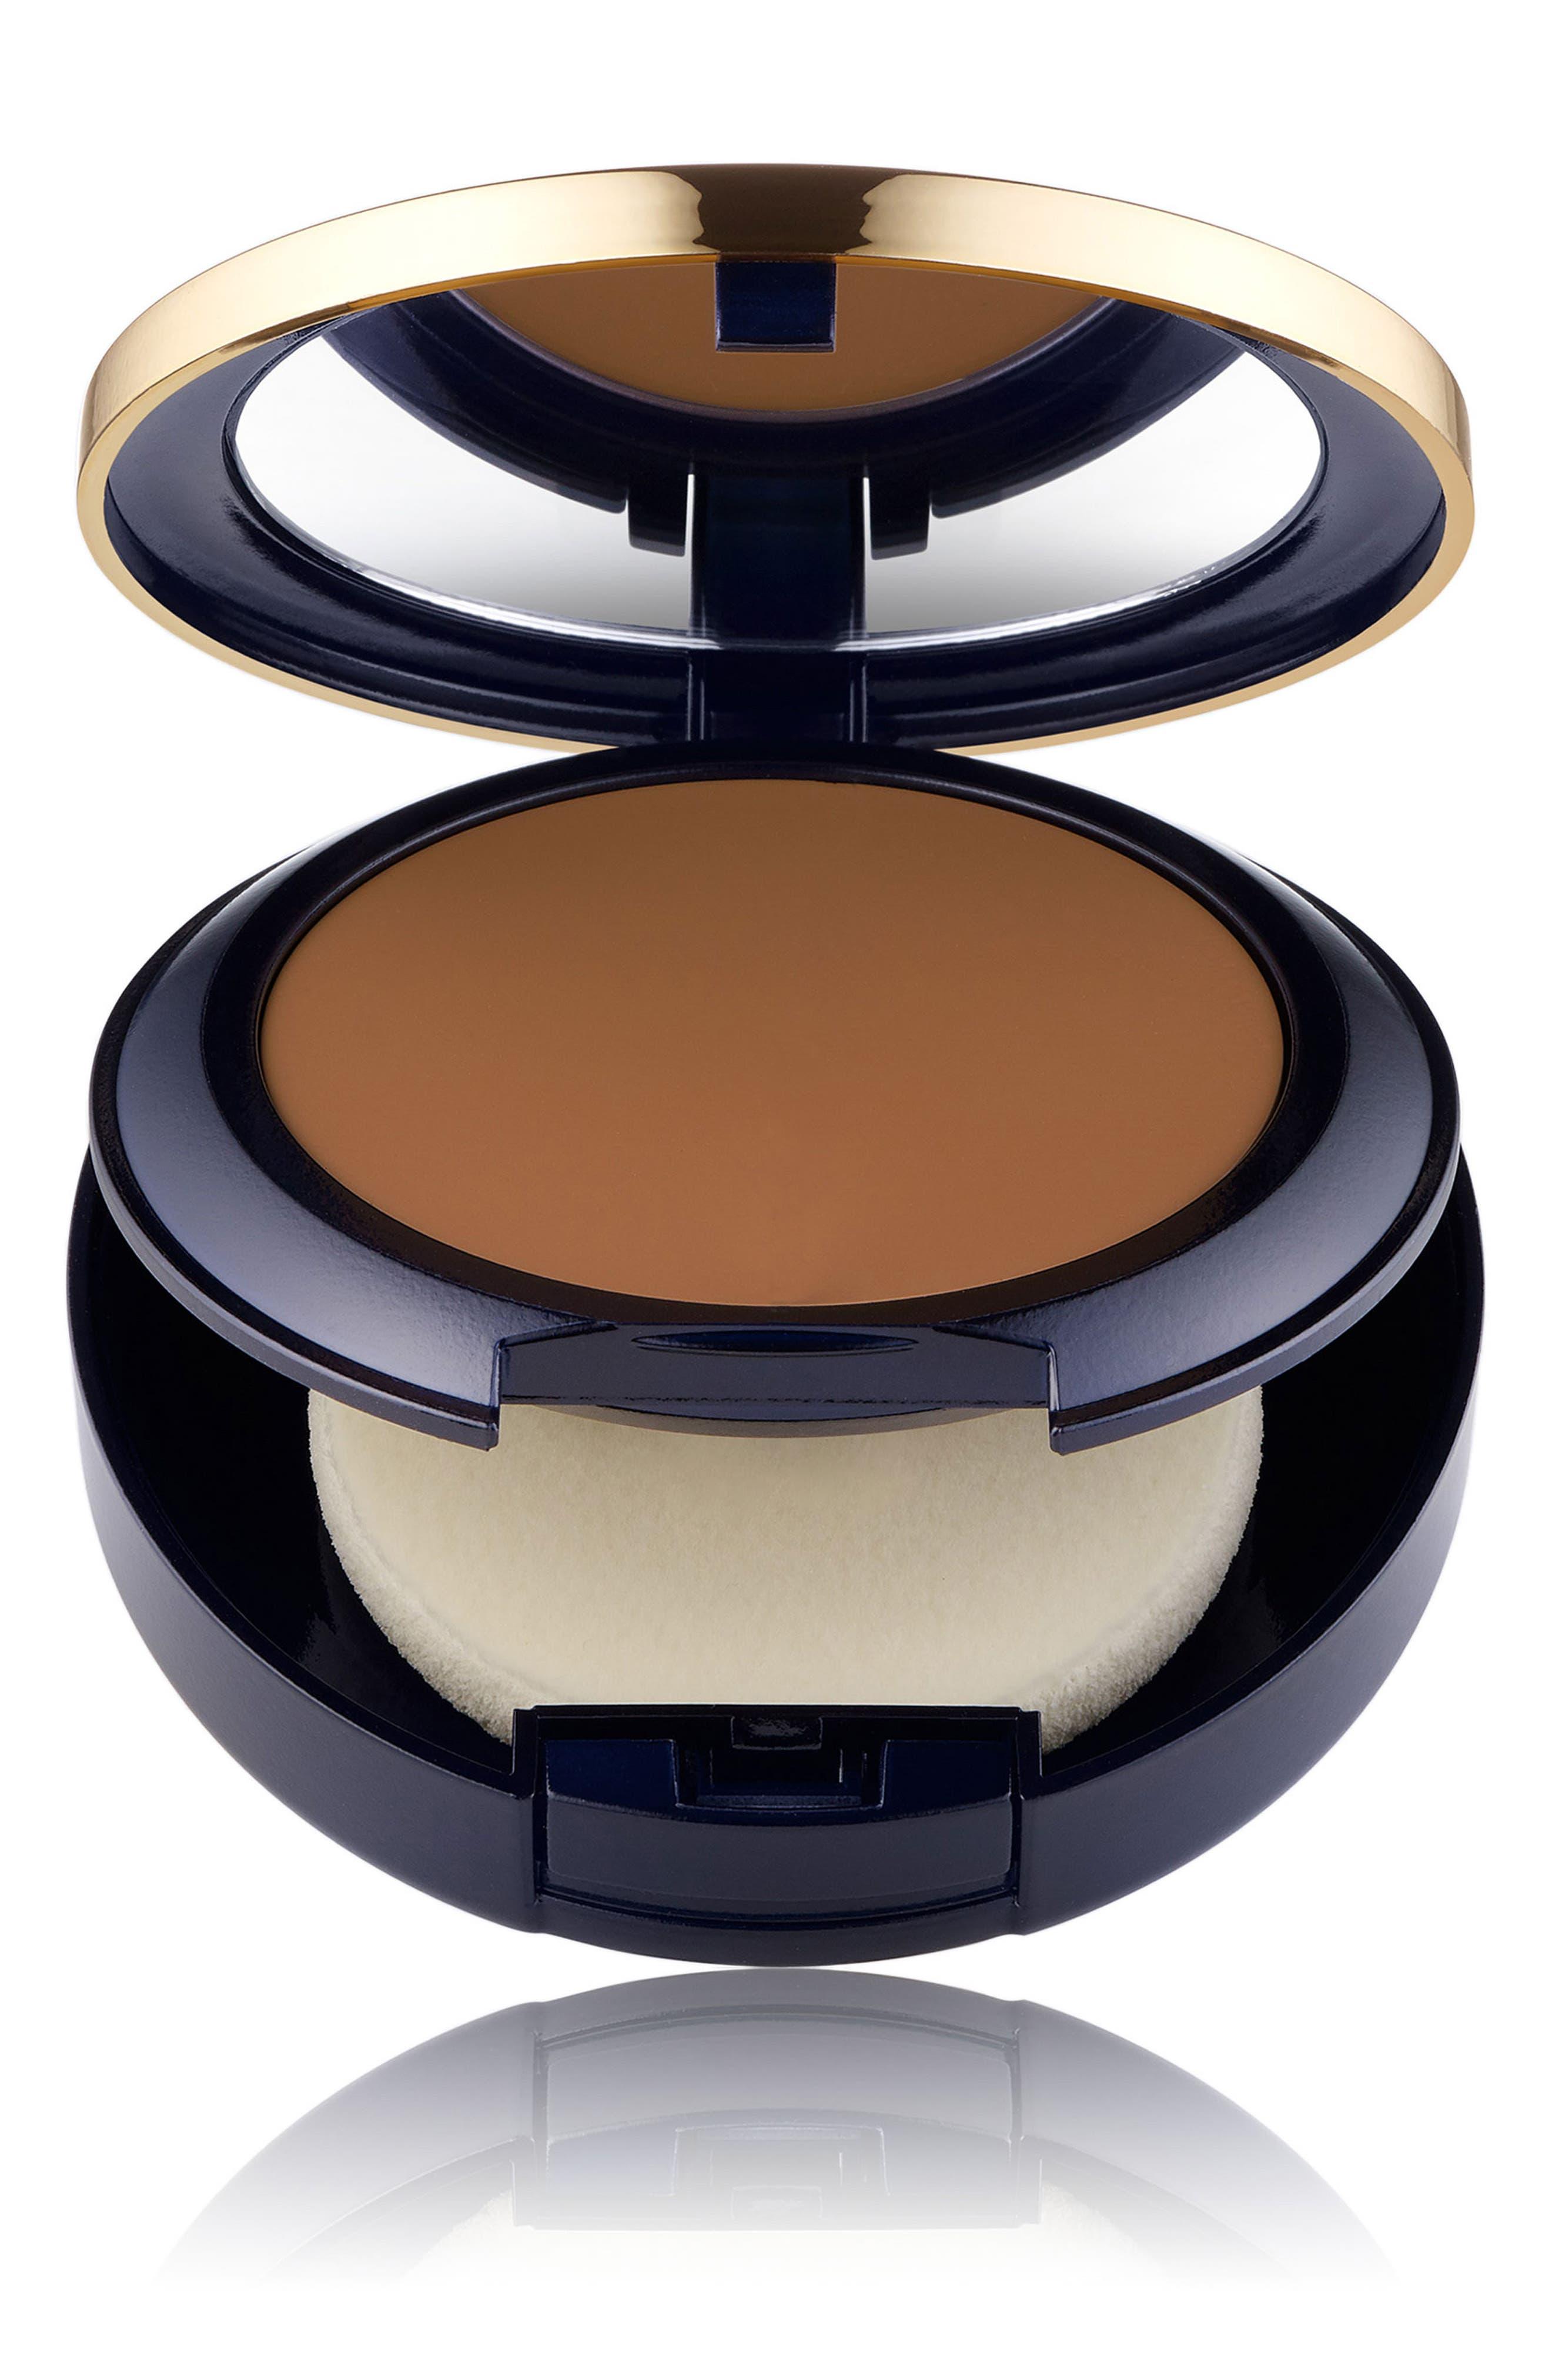 Estee Lauder Double Wear Stay In Place Matte Powder Foundation - 8C1 Rich Java